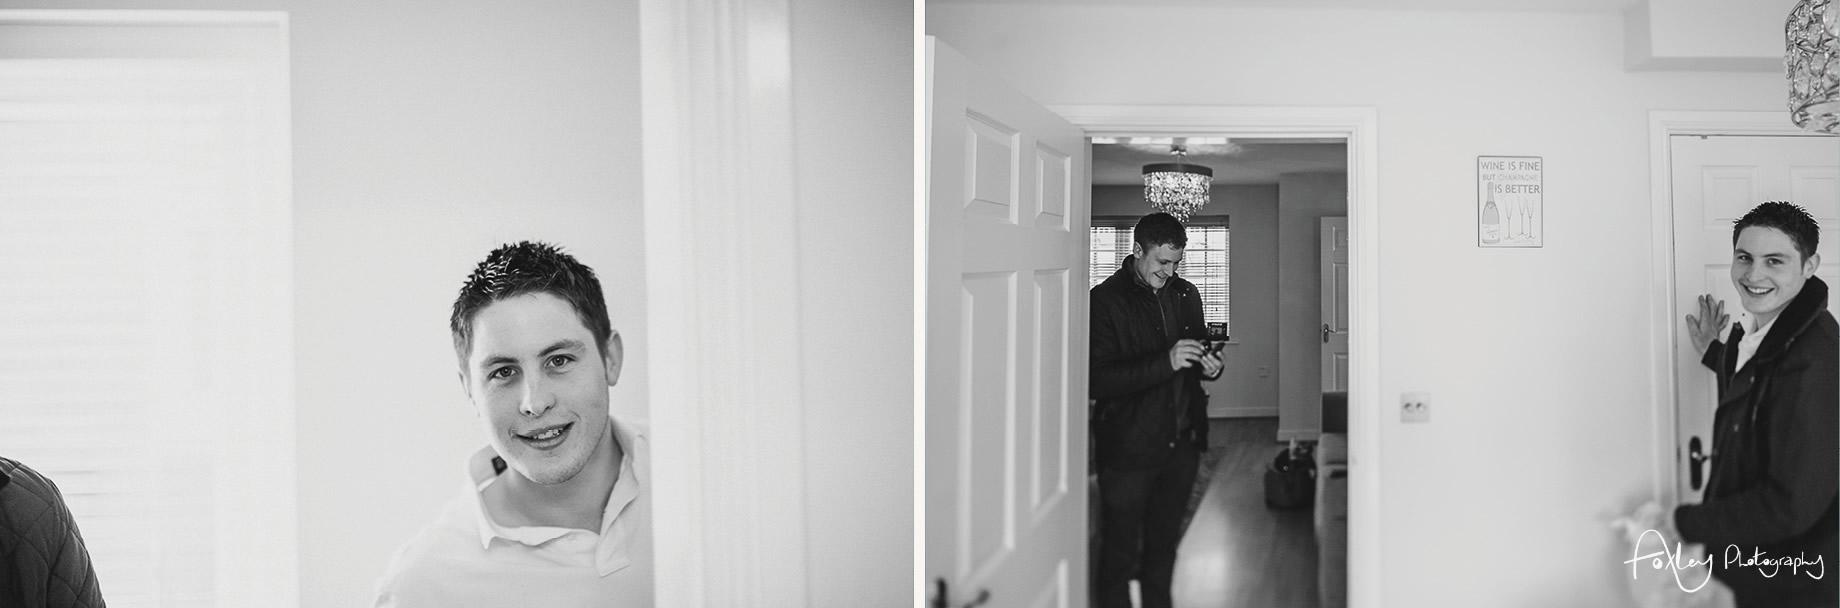 Gemma and Lewis' Wedding at Mitton Hall 009